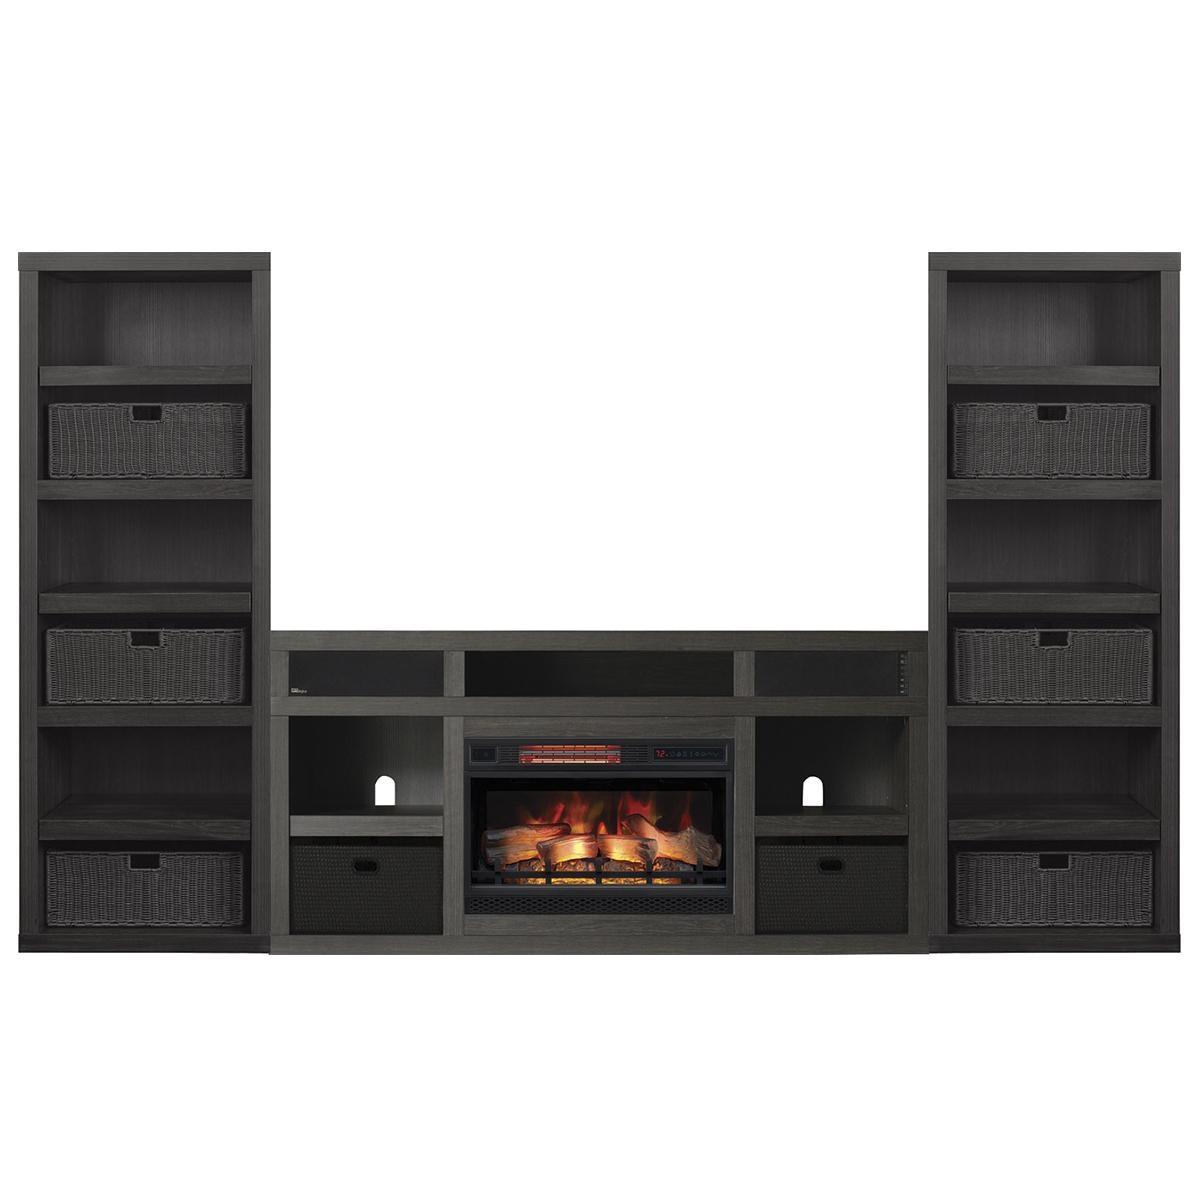 Fireplace Des Moines Luxury Fabio Flames Greatlin 3 Piece Fireplace Entertainment Wall